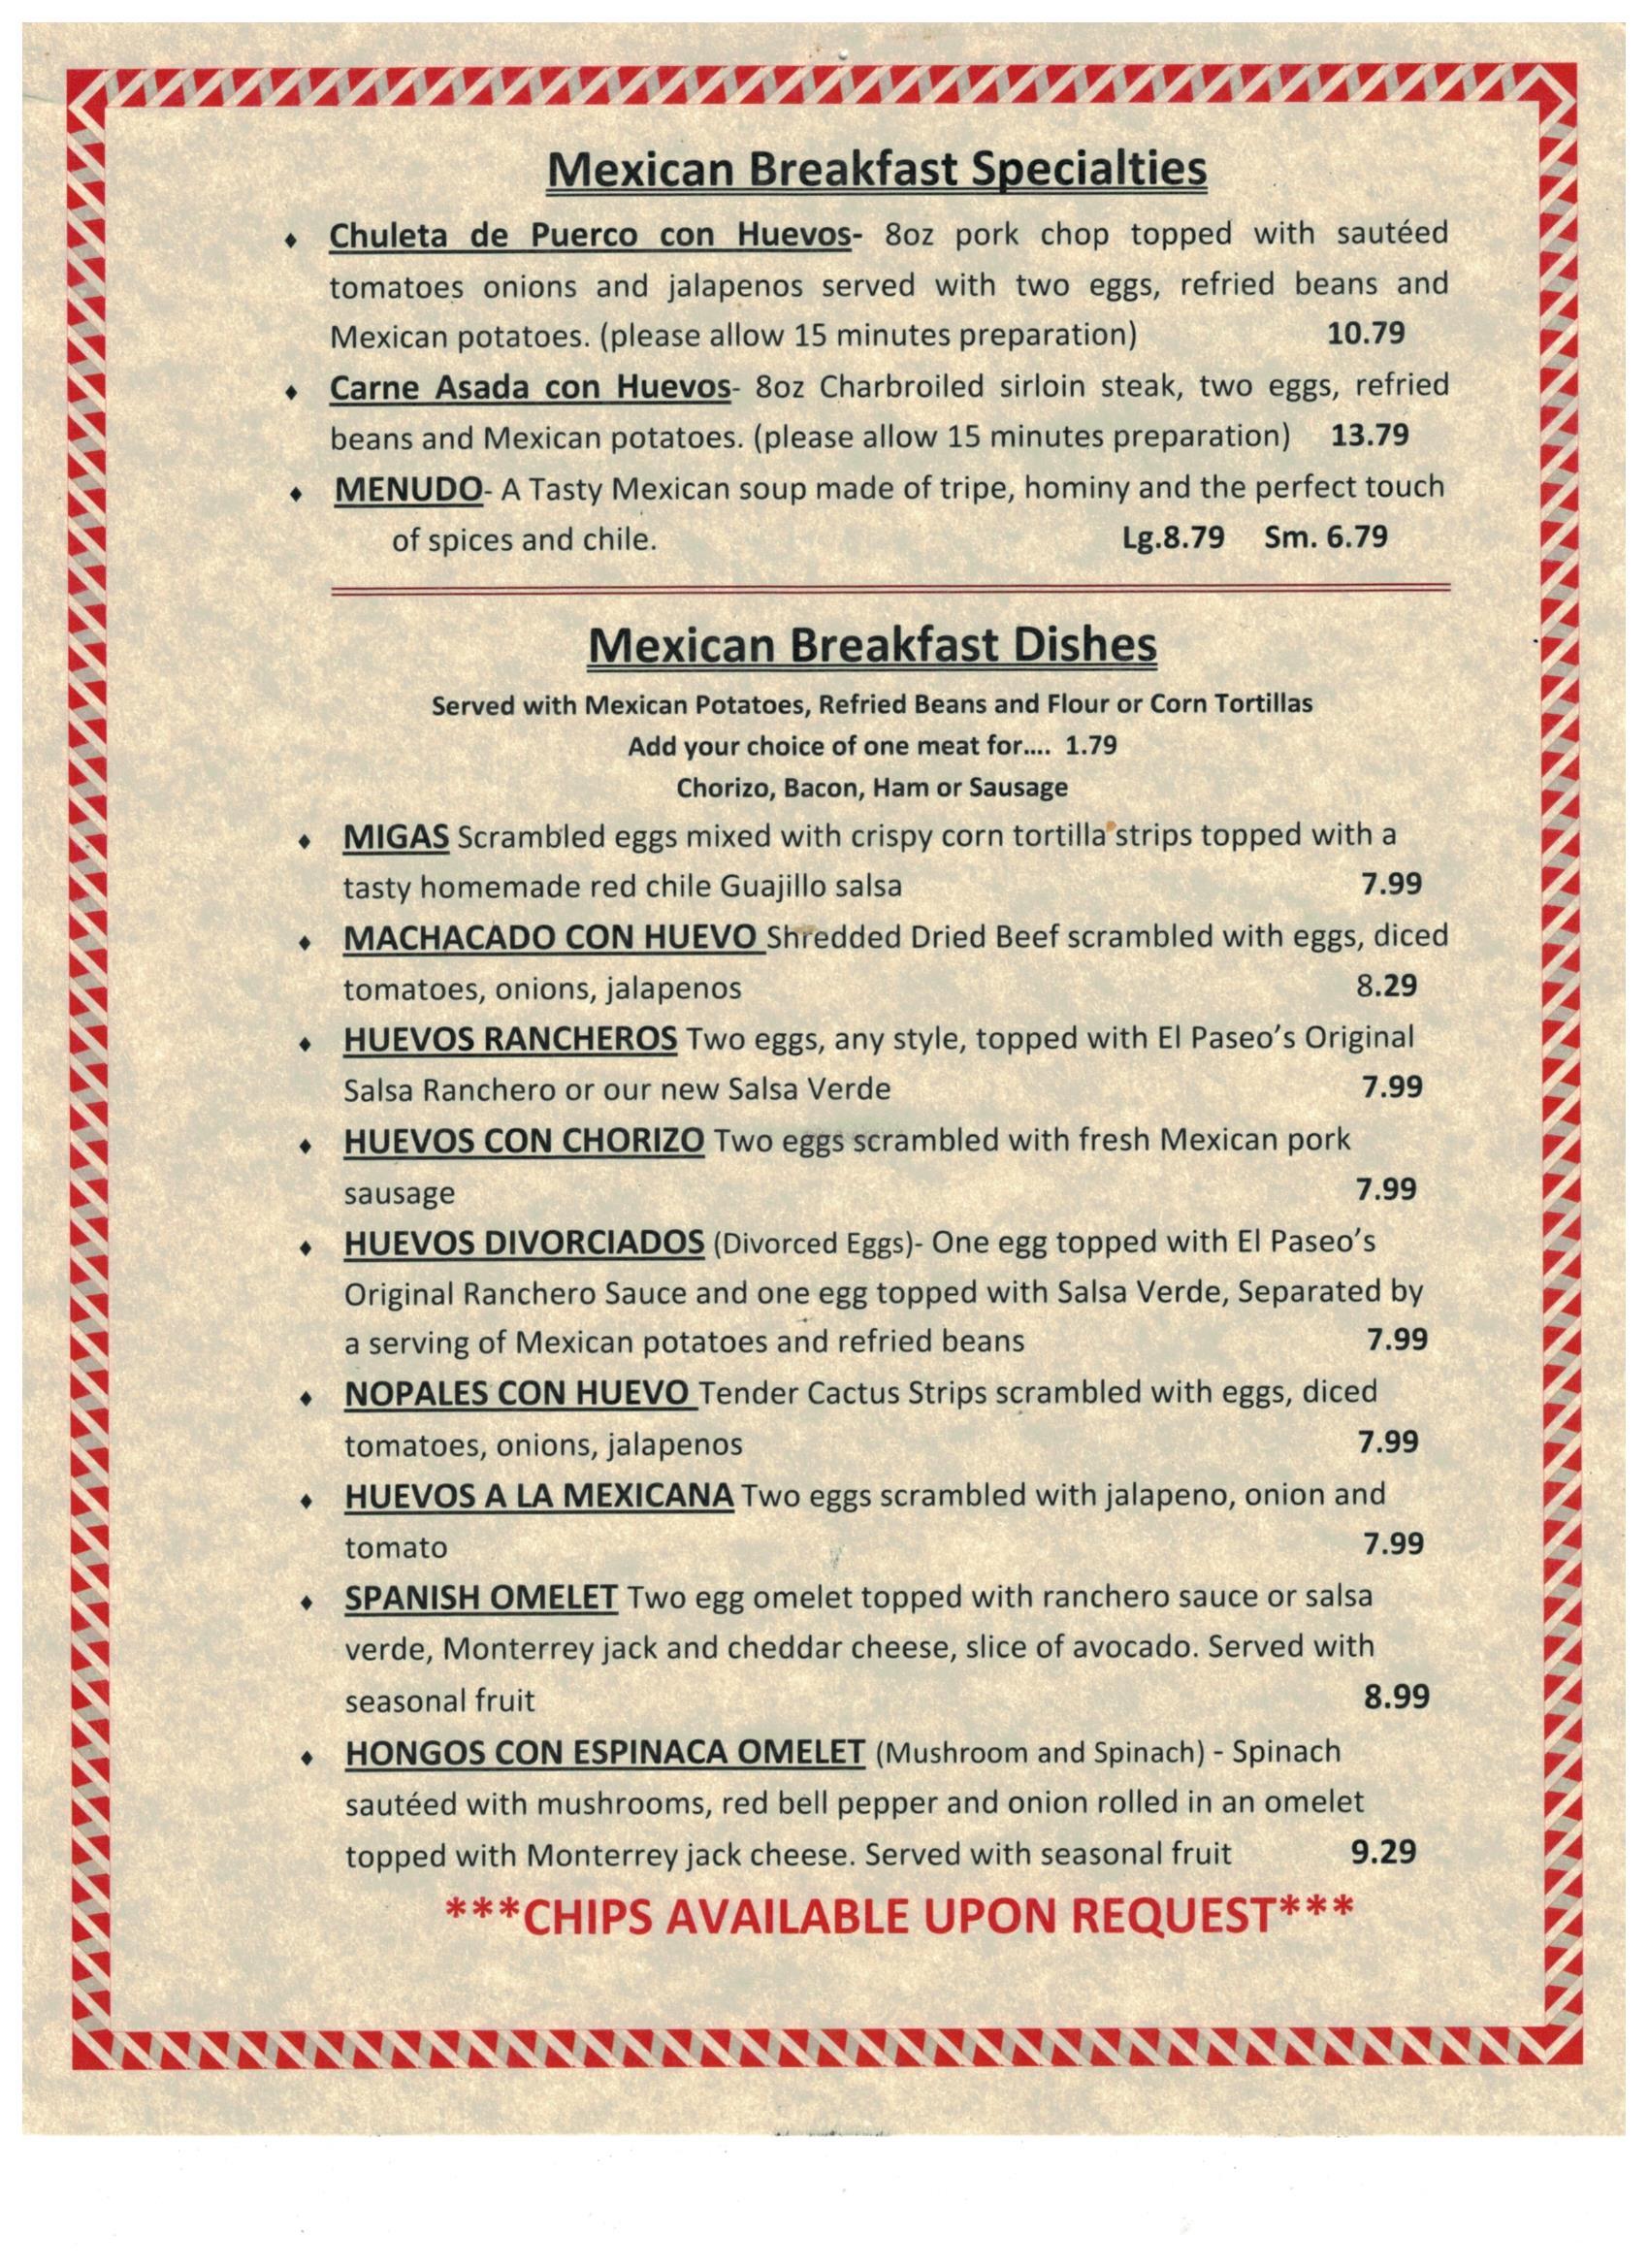 el paseo mexican restaurant - mexican food at its finest